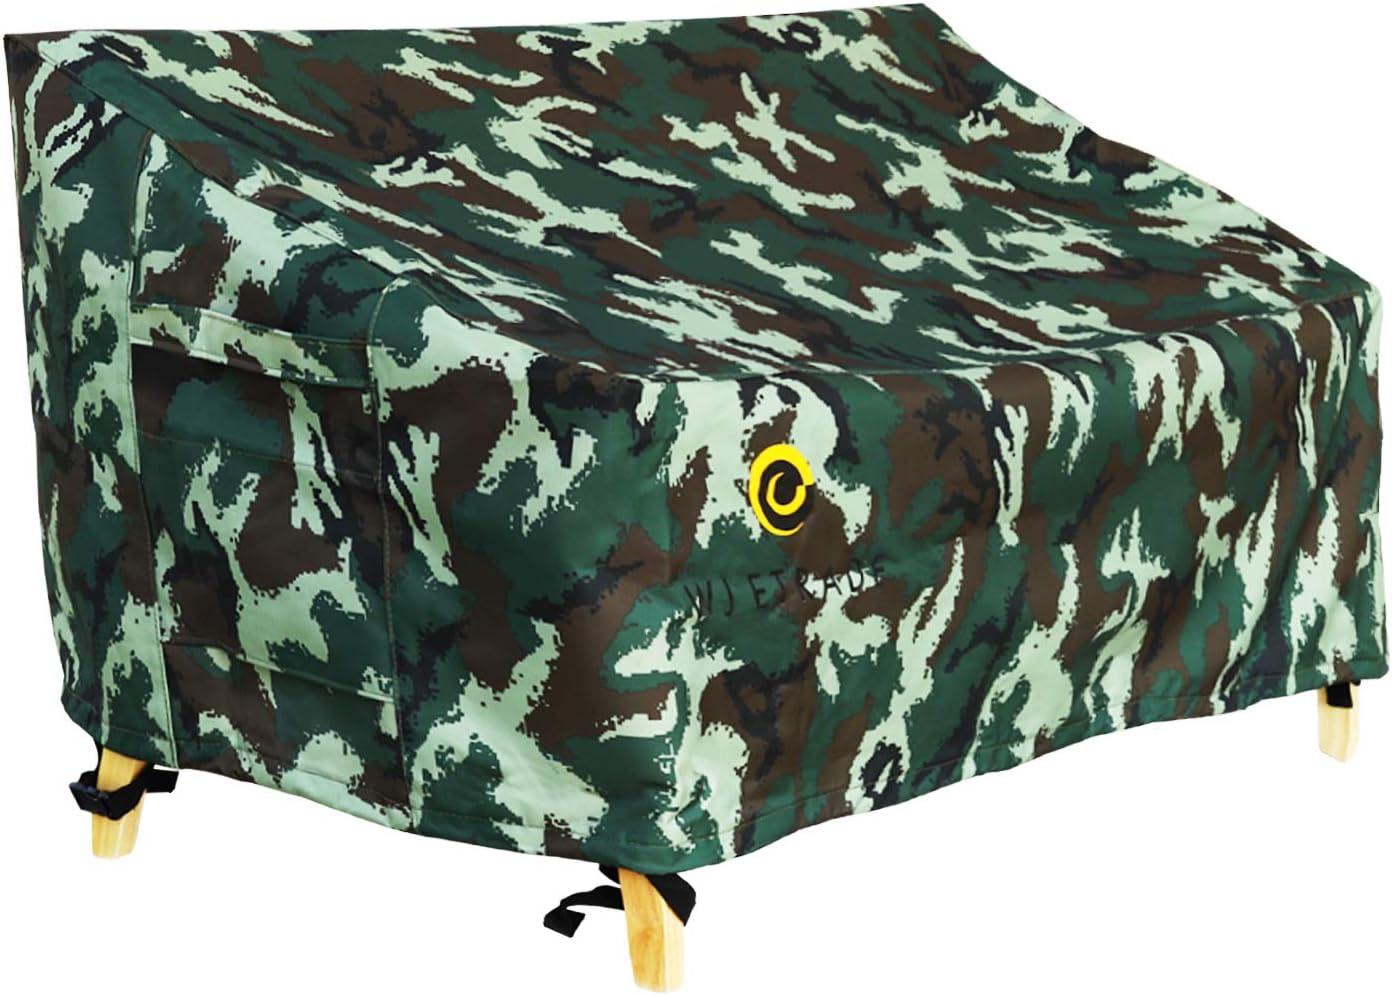 "WJ eTrade Patio Loveseat Covers, Waterproof UV Resistant No Fading Heavy Duty Outdoor 2-Seat Bench Cover, 54"" Wx38 Dx35 H, Camo: Garden & Outdoor"